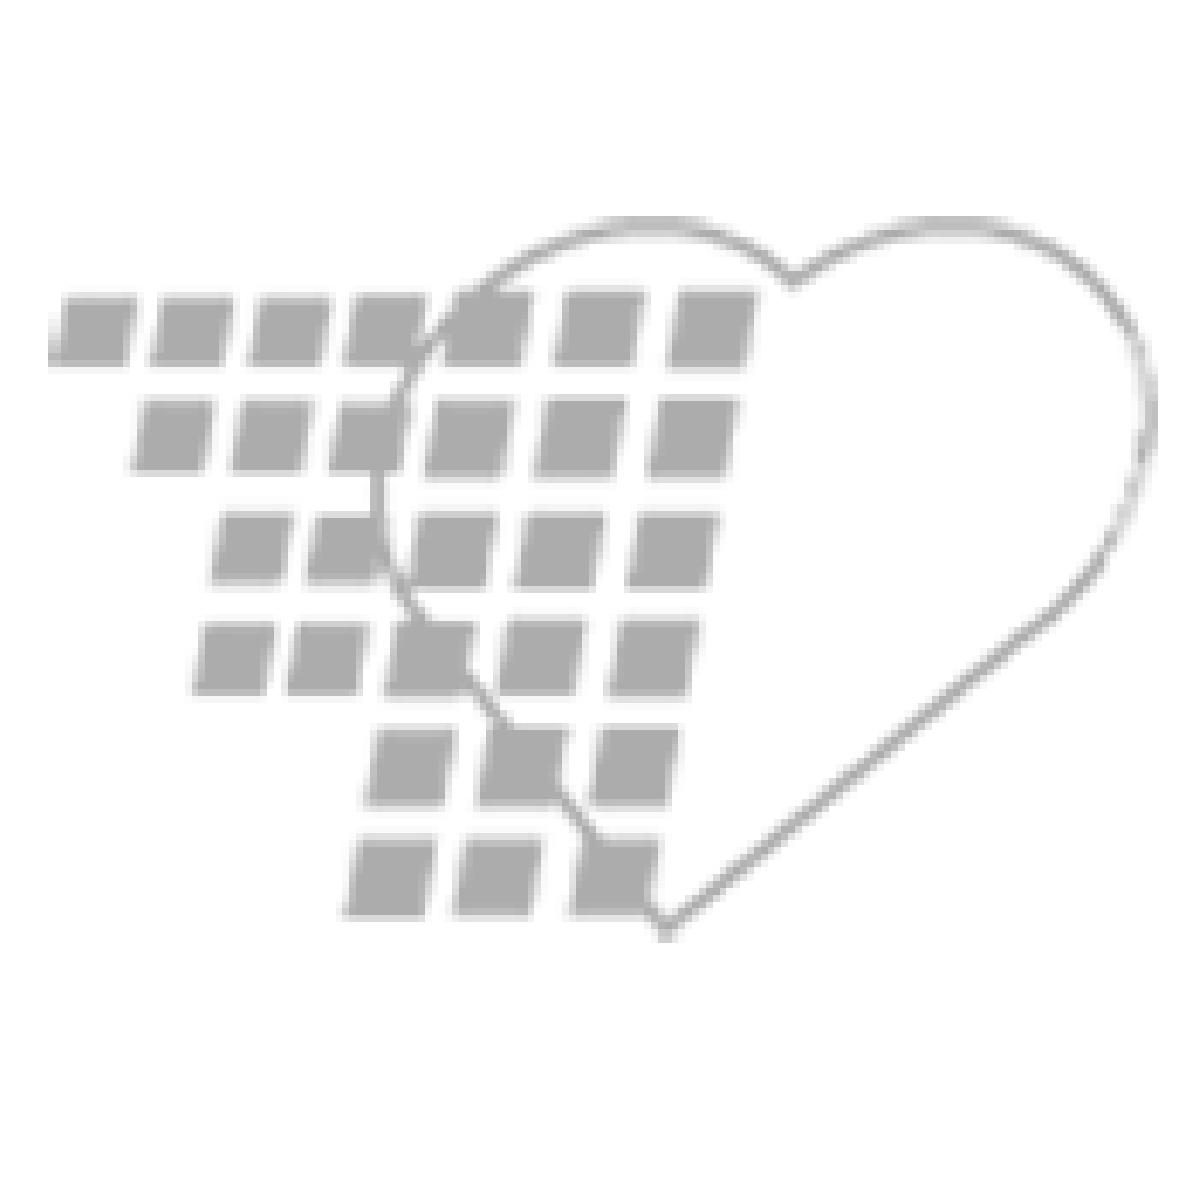 02-33-1130 Detecto® Mechanical Floor Scale